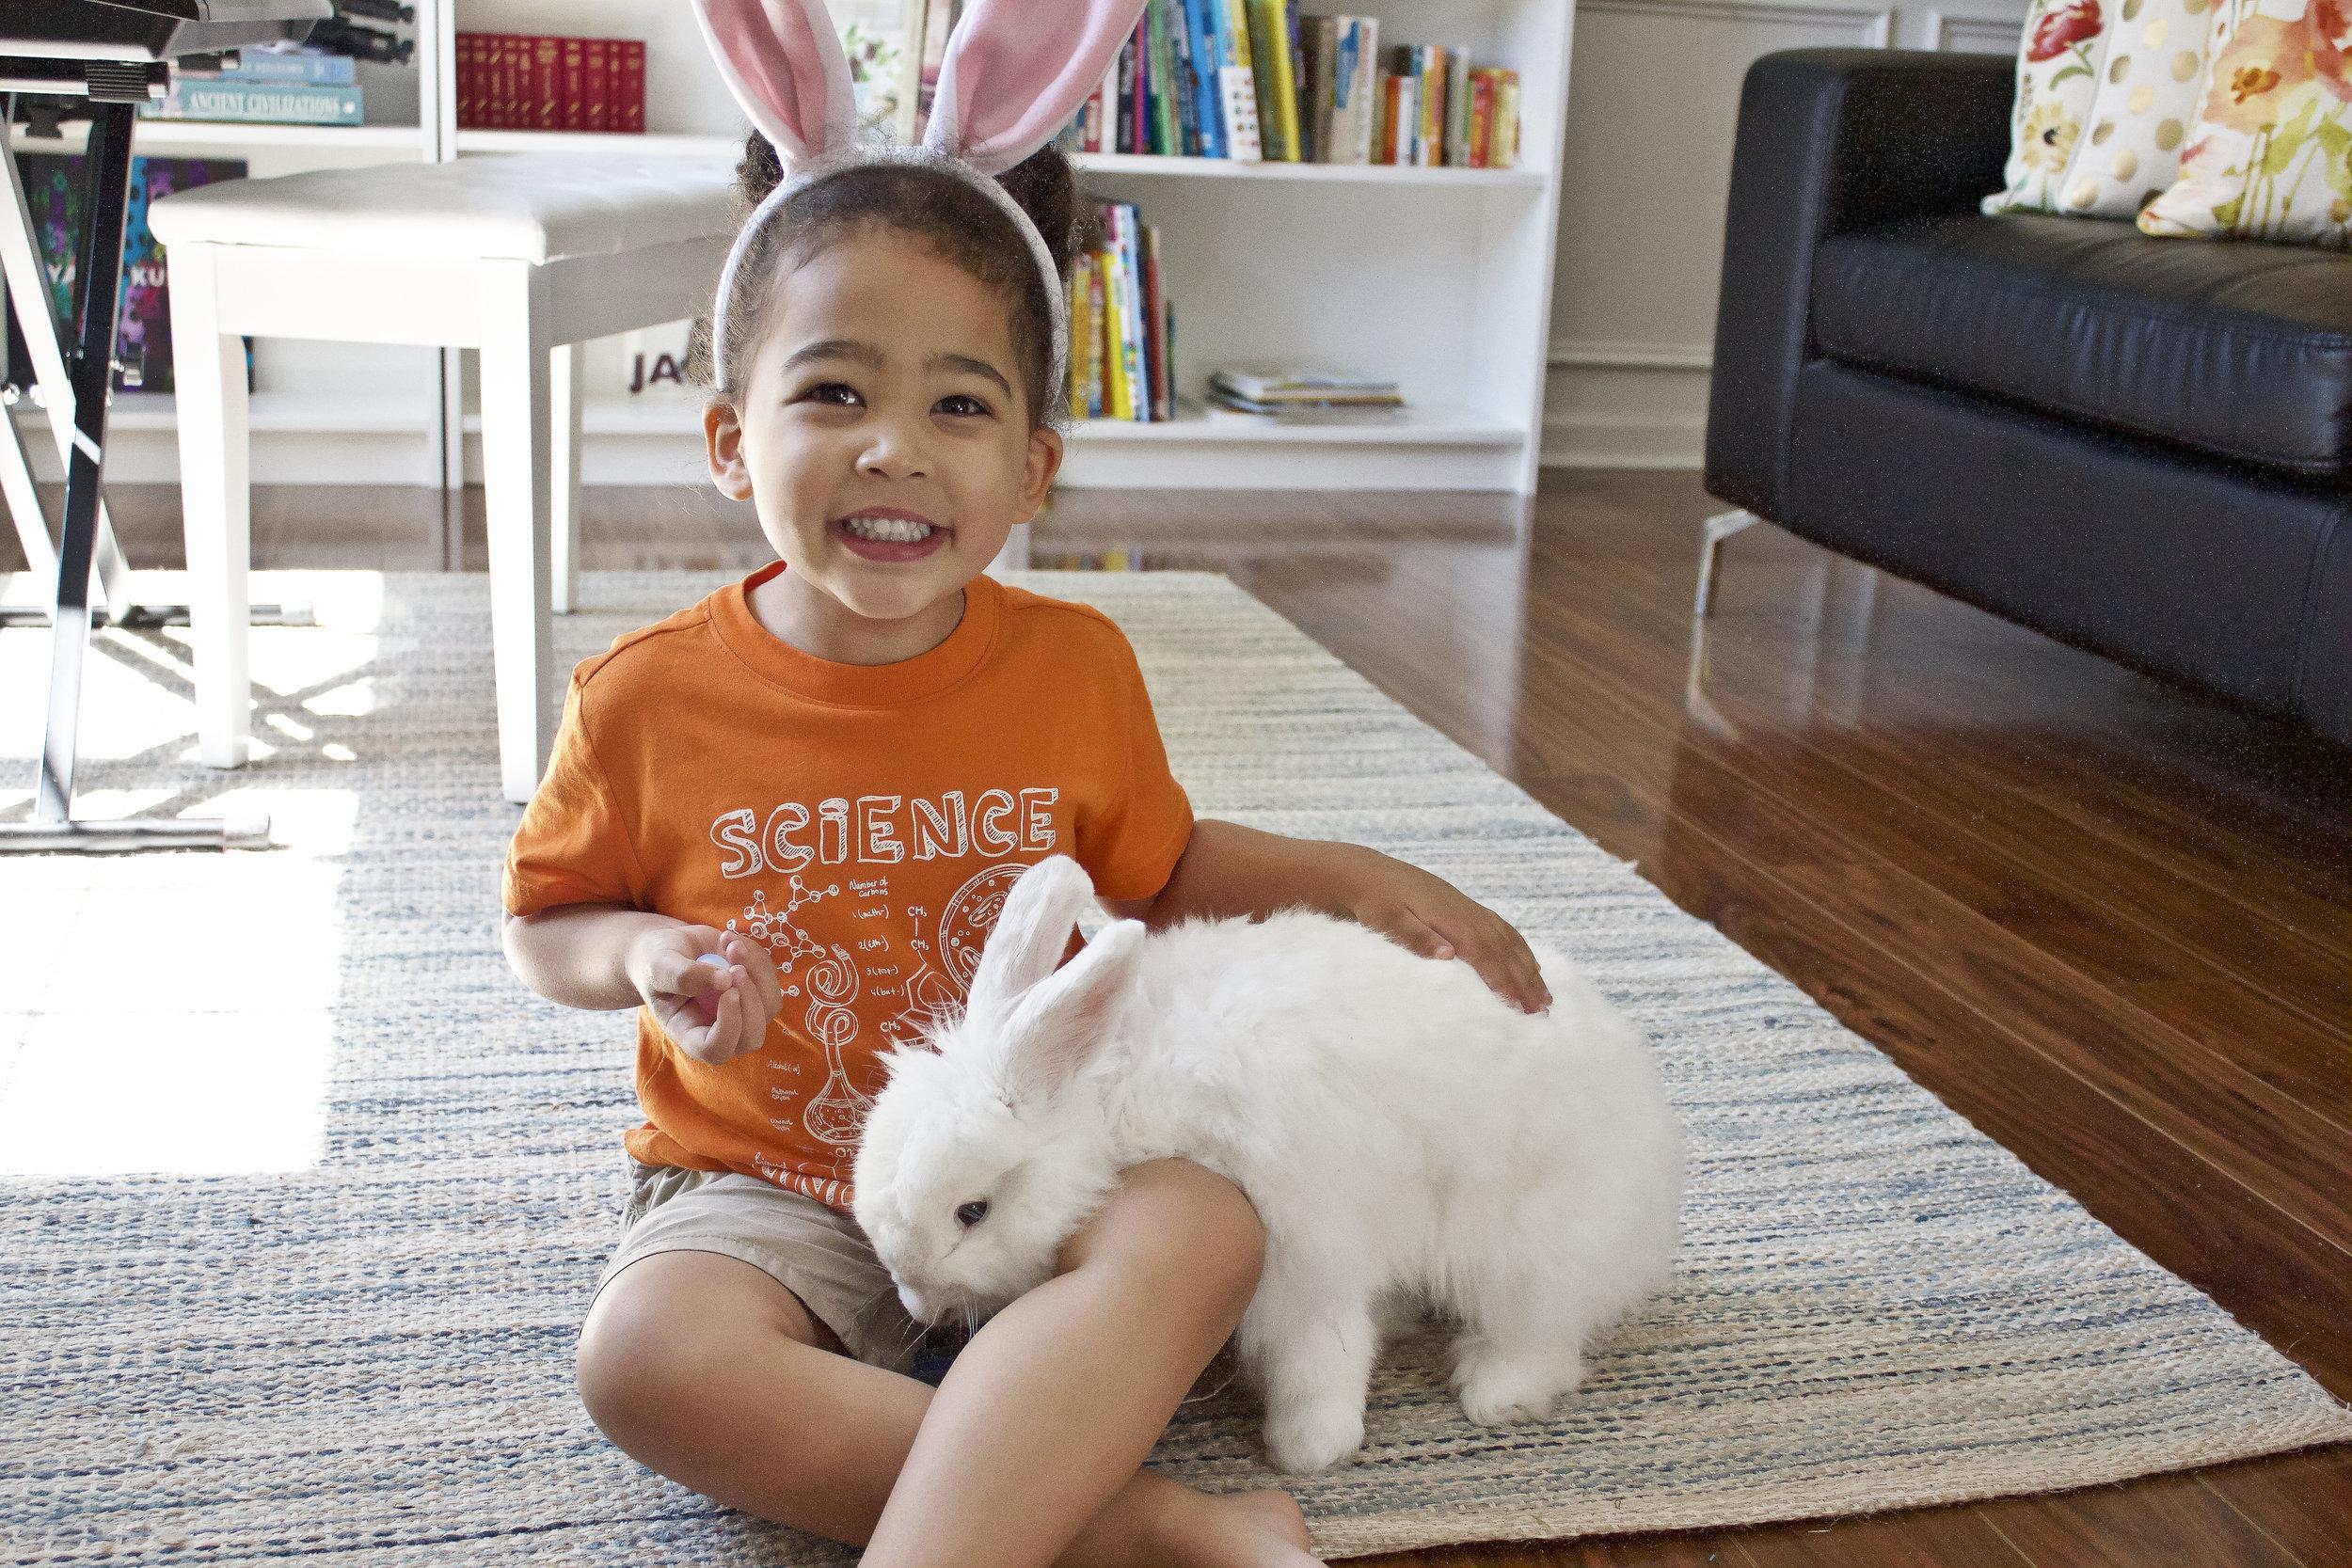 Bunny-sitting Ms. Fluffles